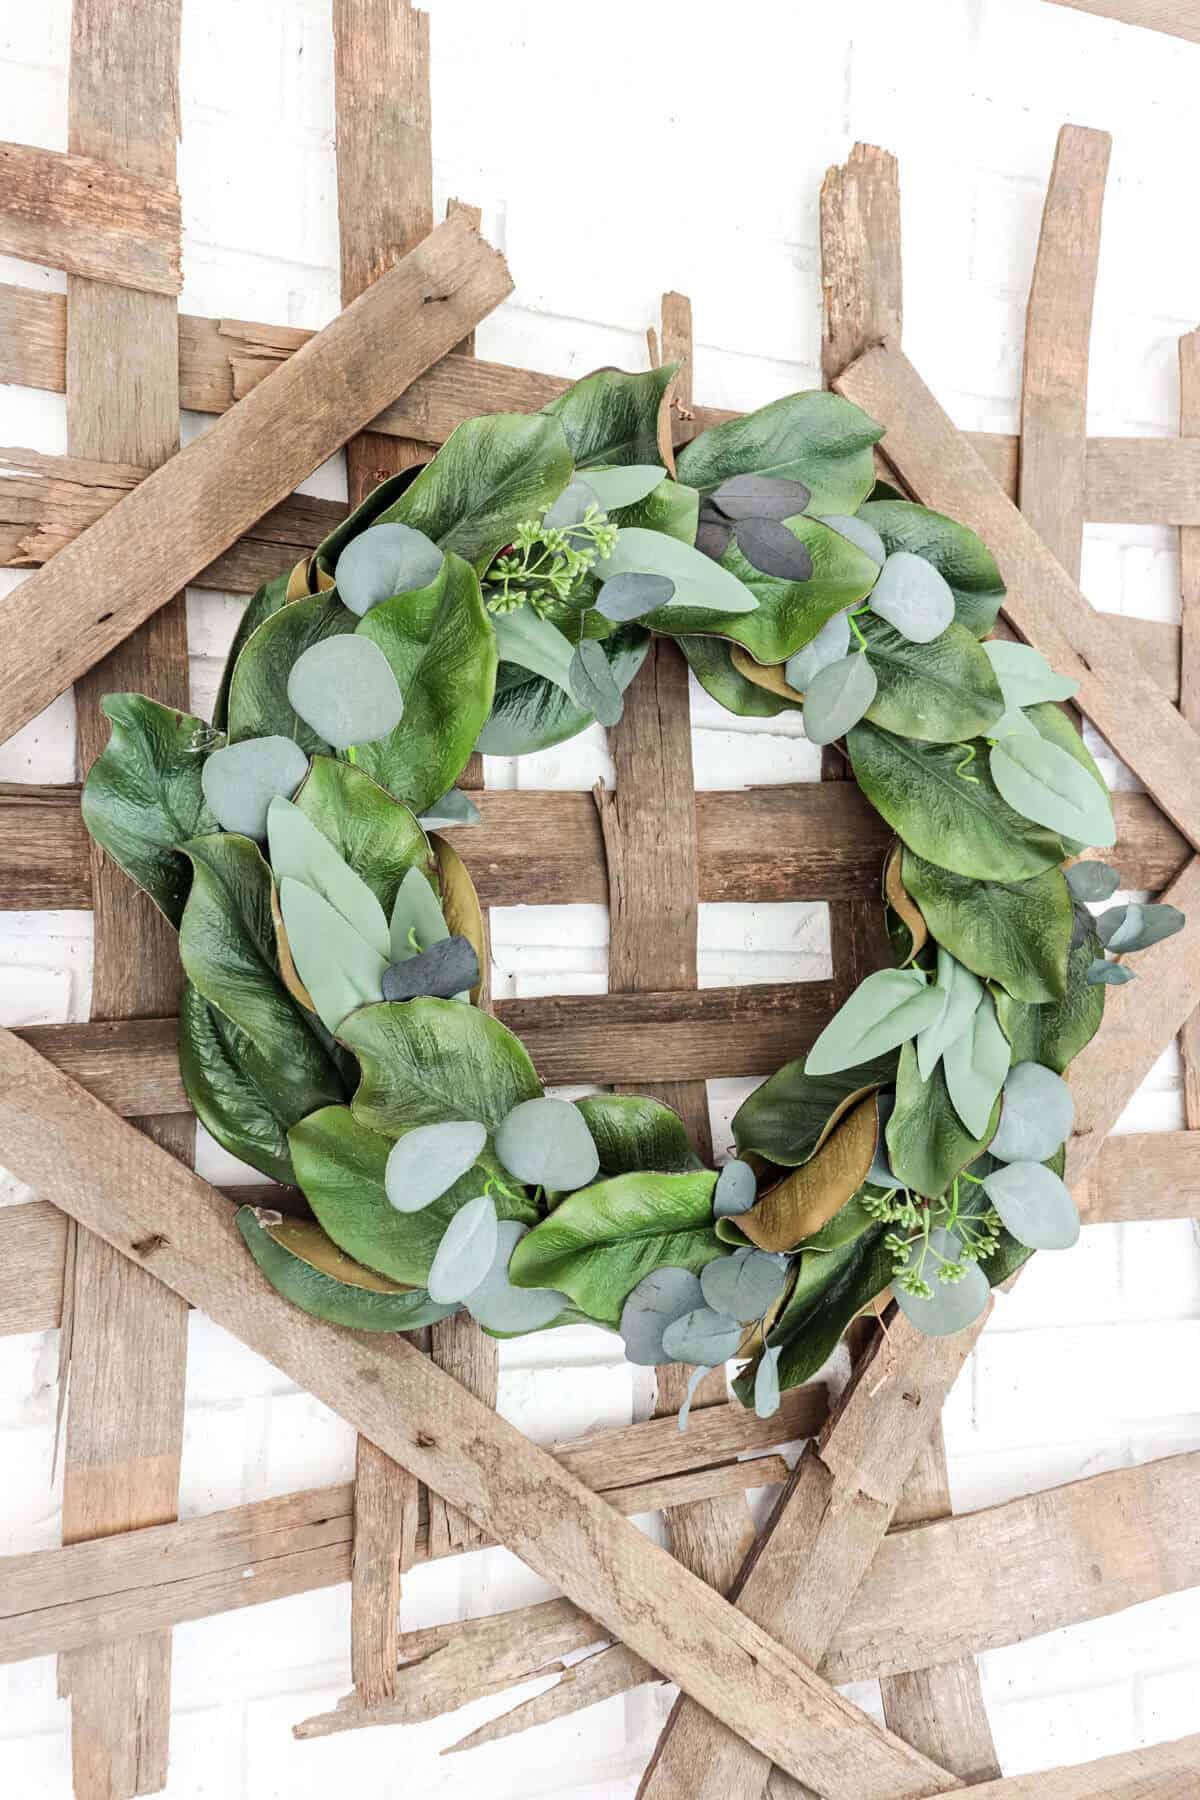 magnolia leaf wreath with eucalyptus hanging on a tobacco basket